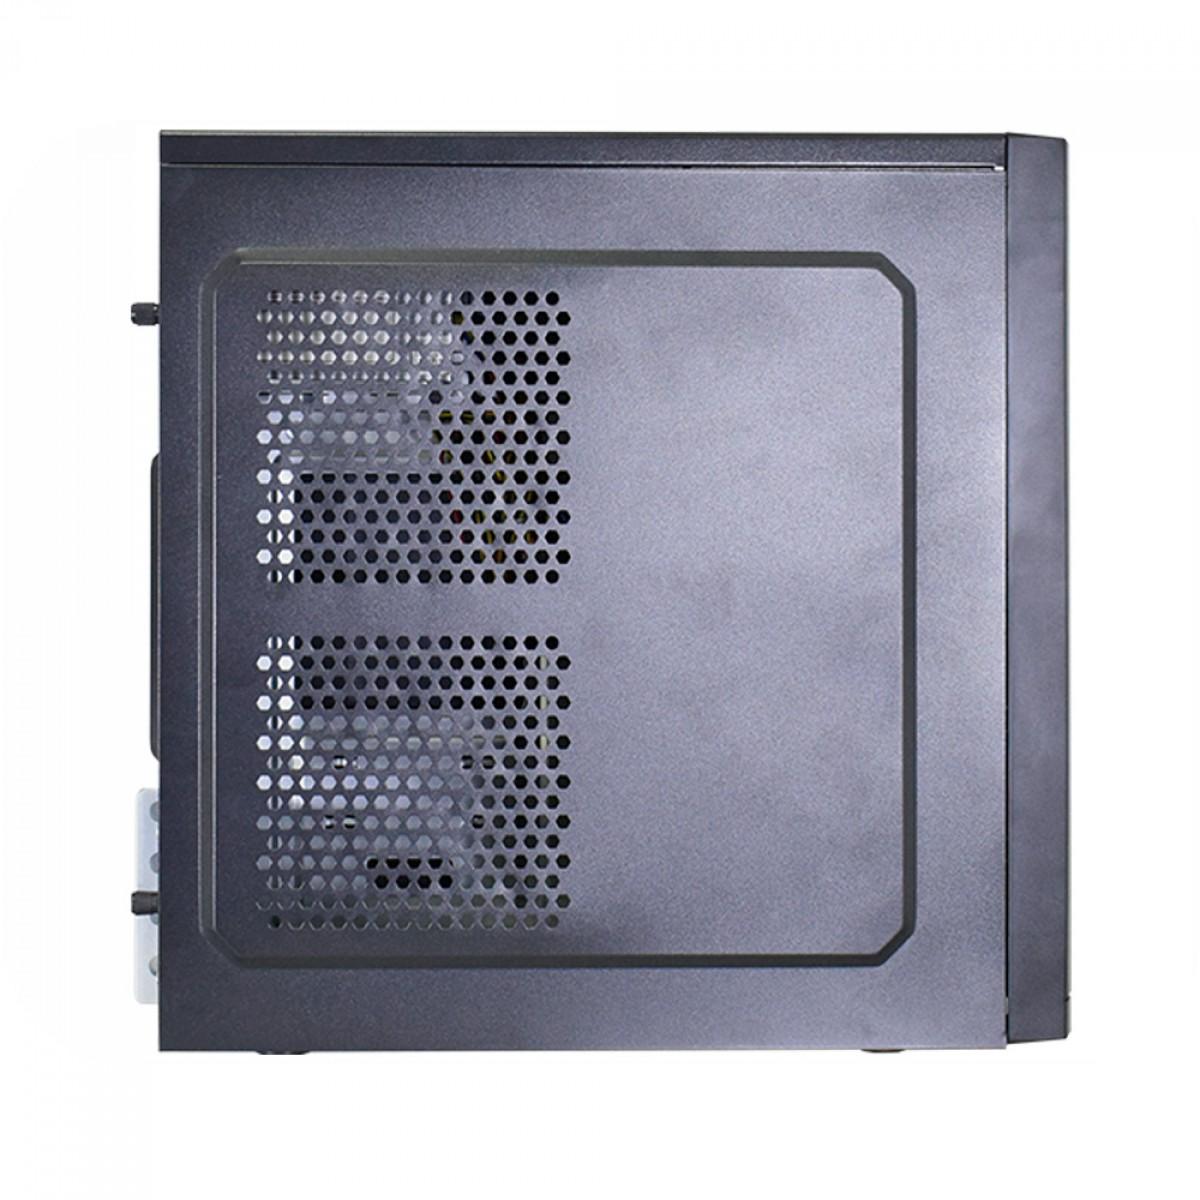 Computador T-home NTC 4301 GA10G Intel Core i3 10100 / 4GB / SSD 240GB